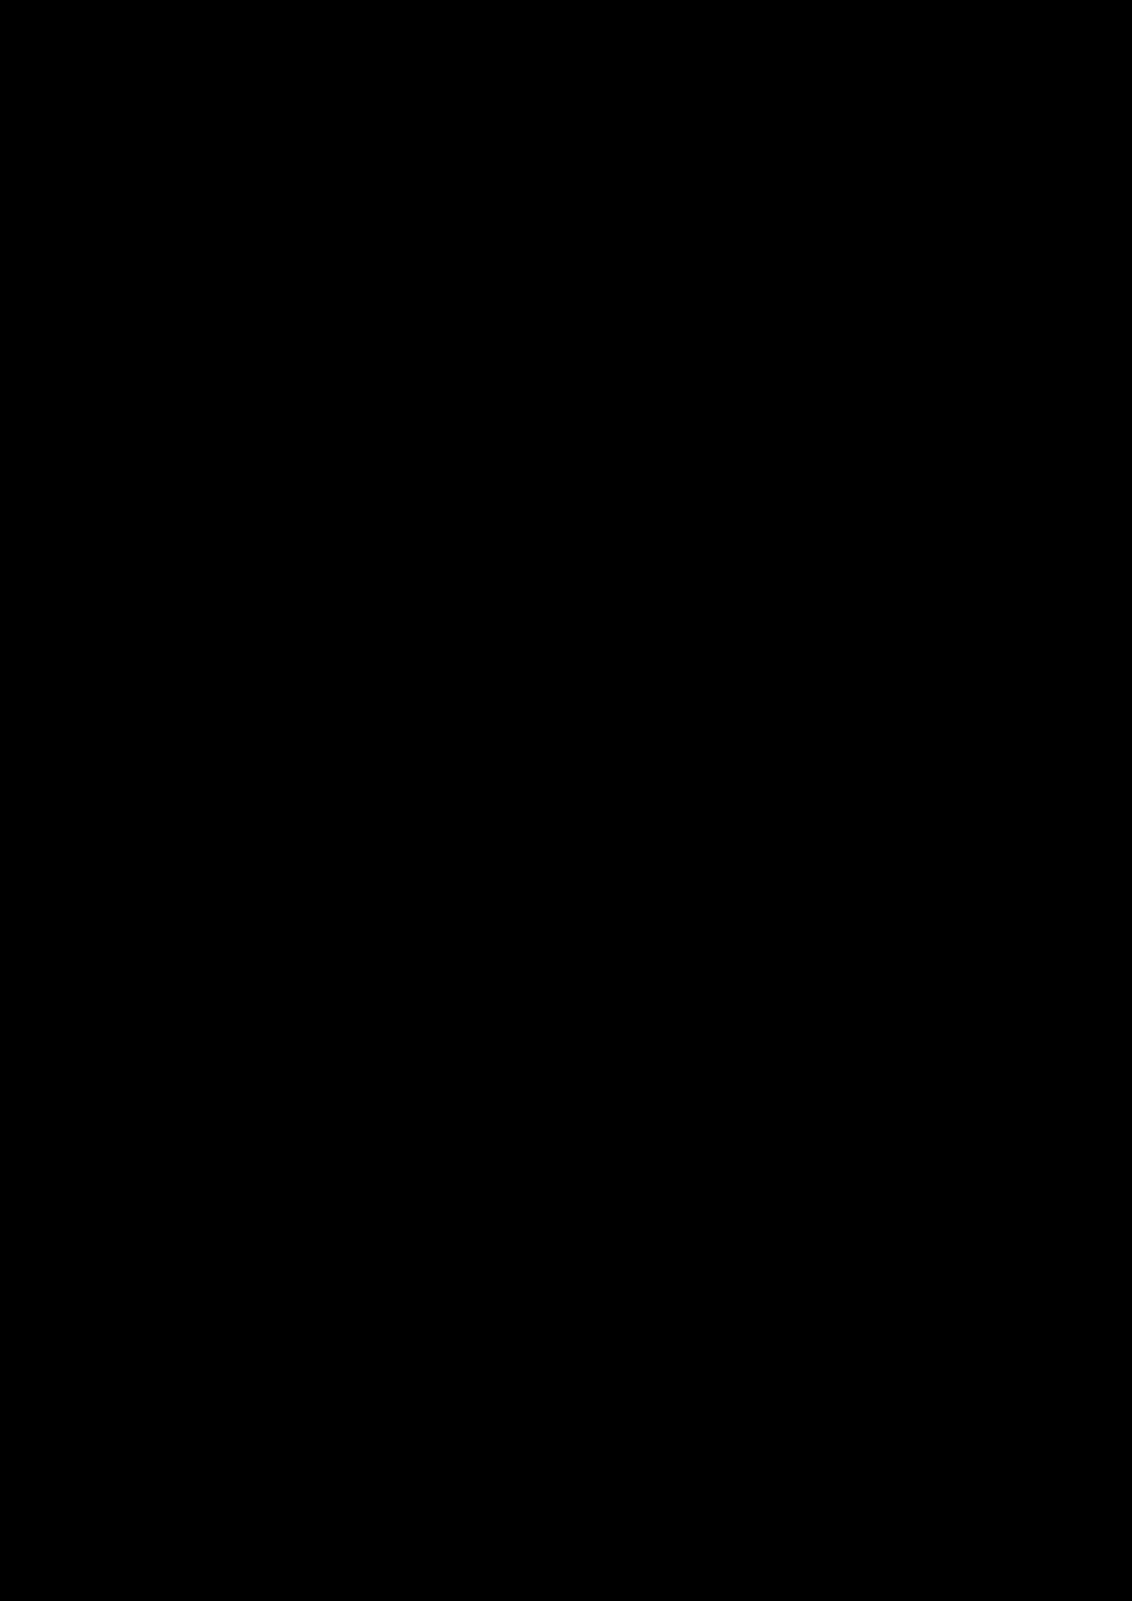 Belyiy sokol slide, Image 140